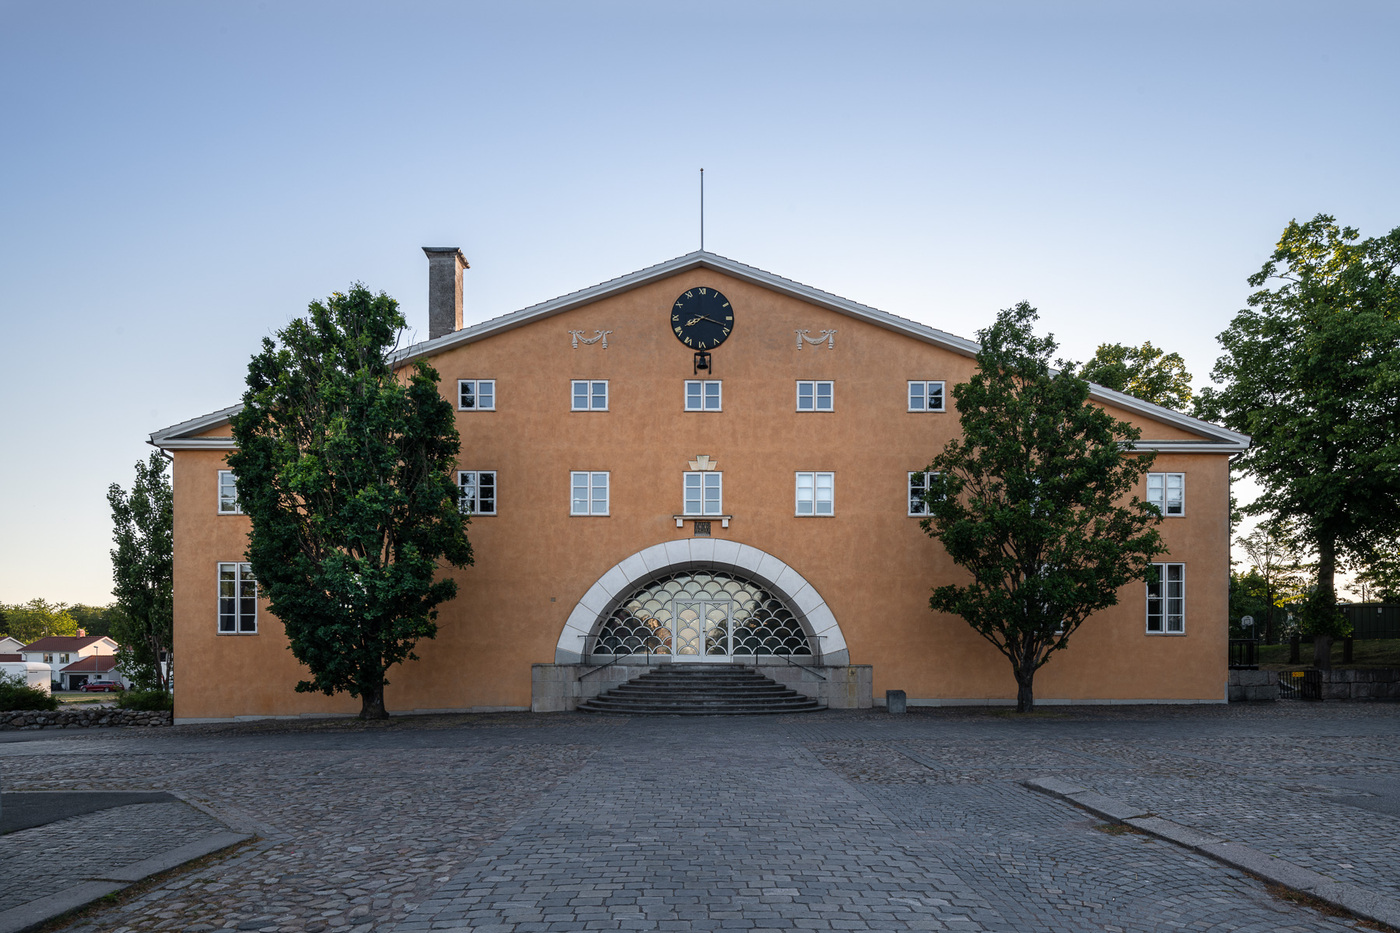 Lasse Olsson - Lister Härads Tingshus - Sölvesborg